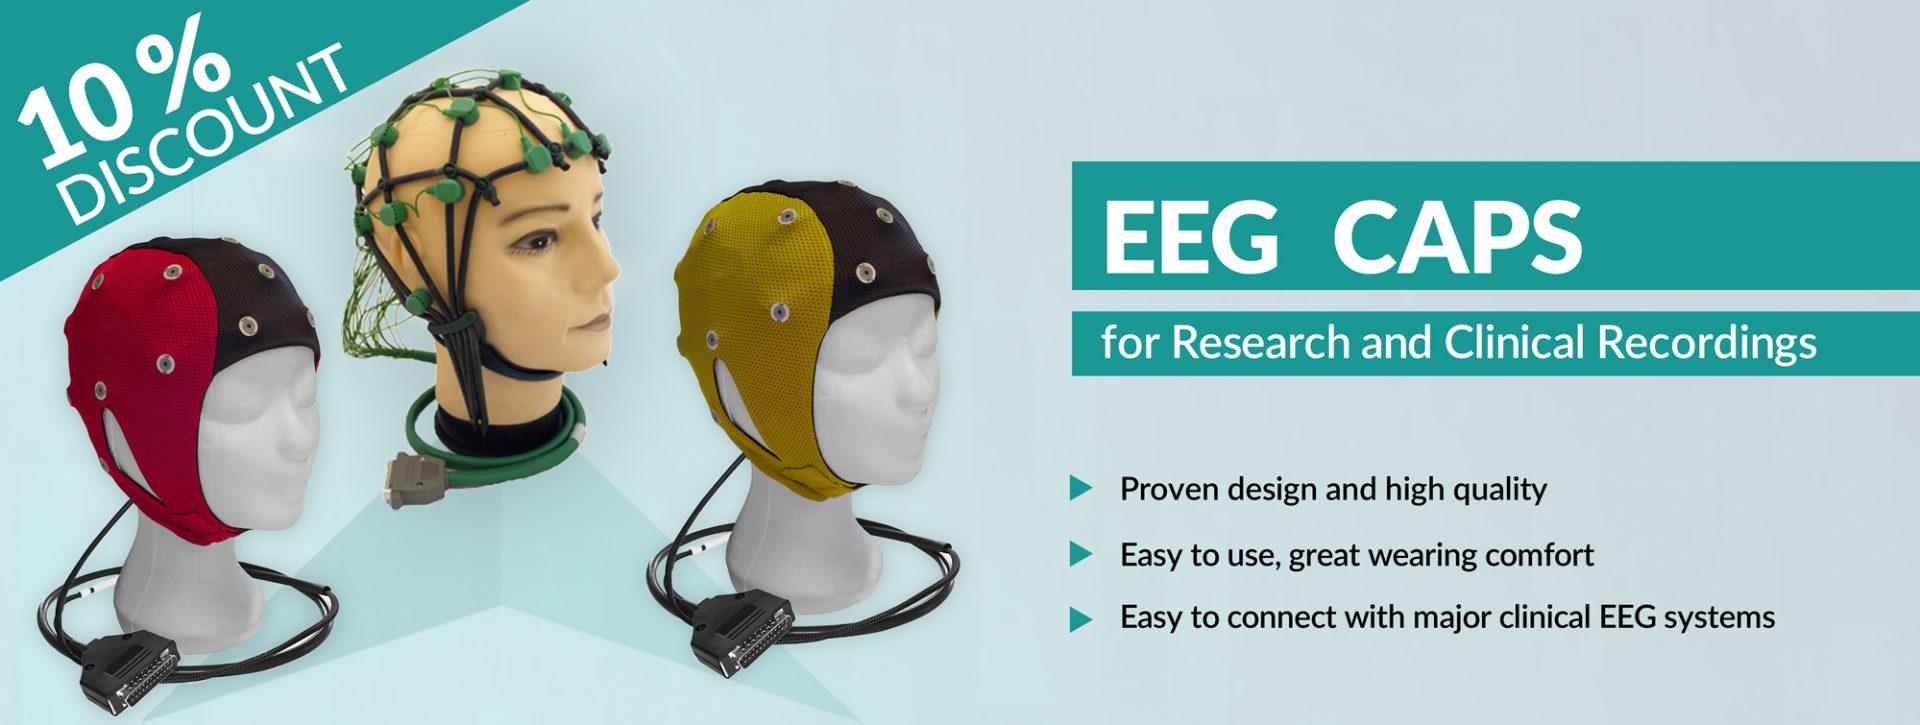 EEG-Caps_CNSAC_2020_01